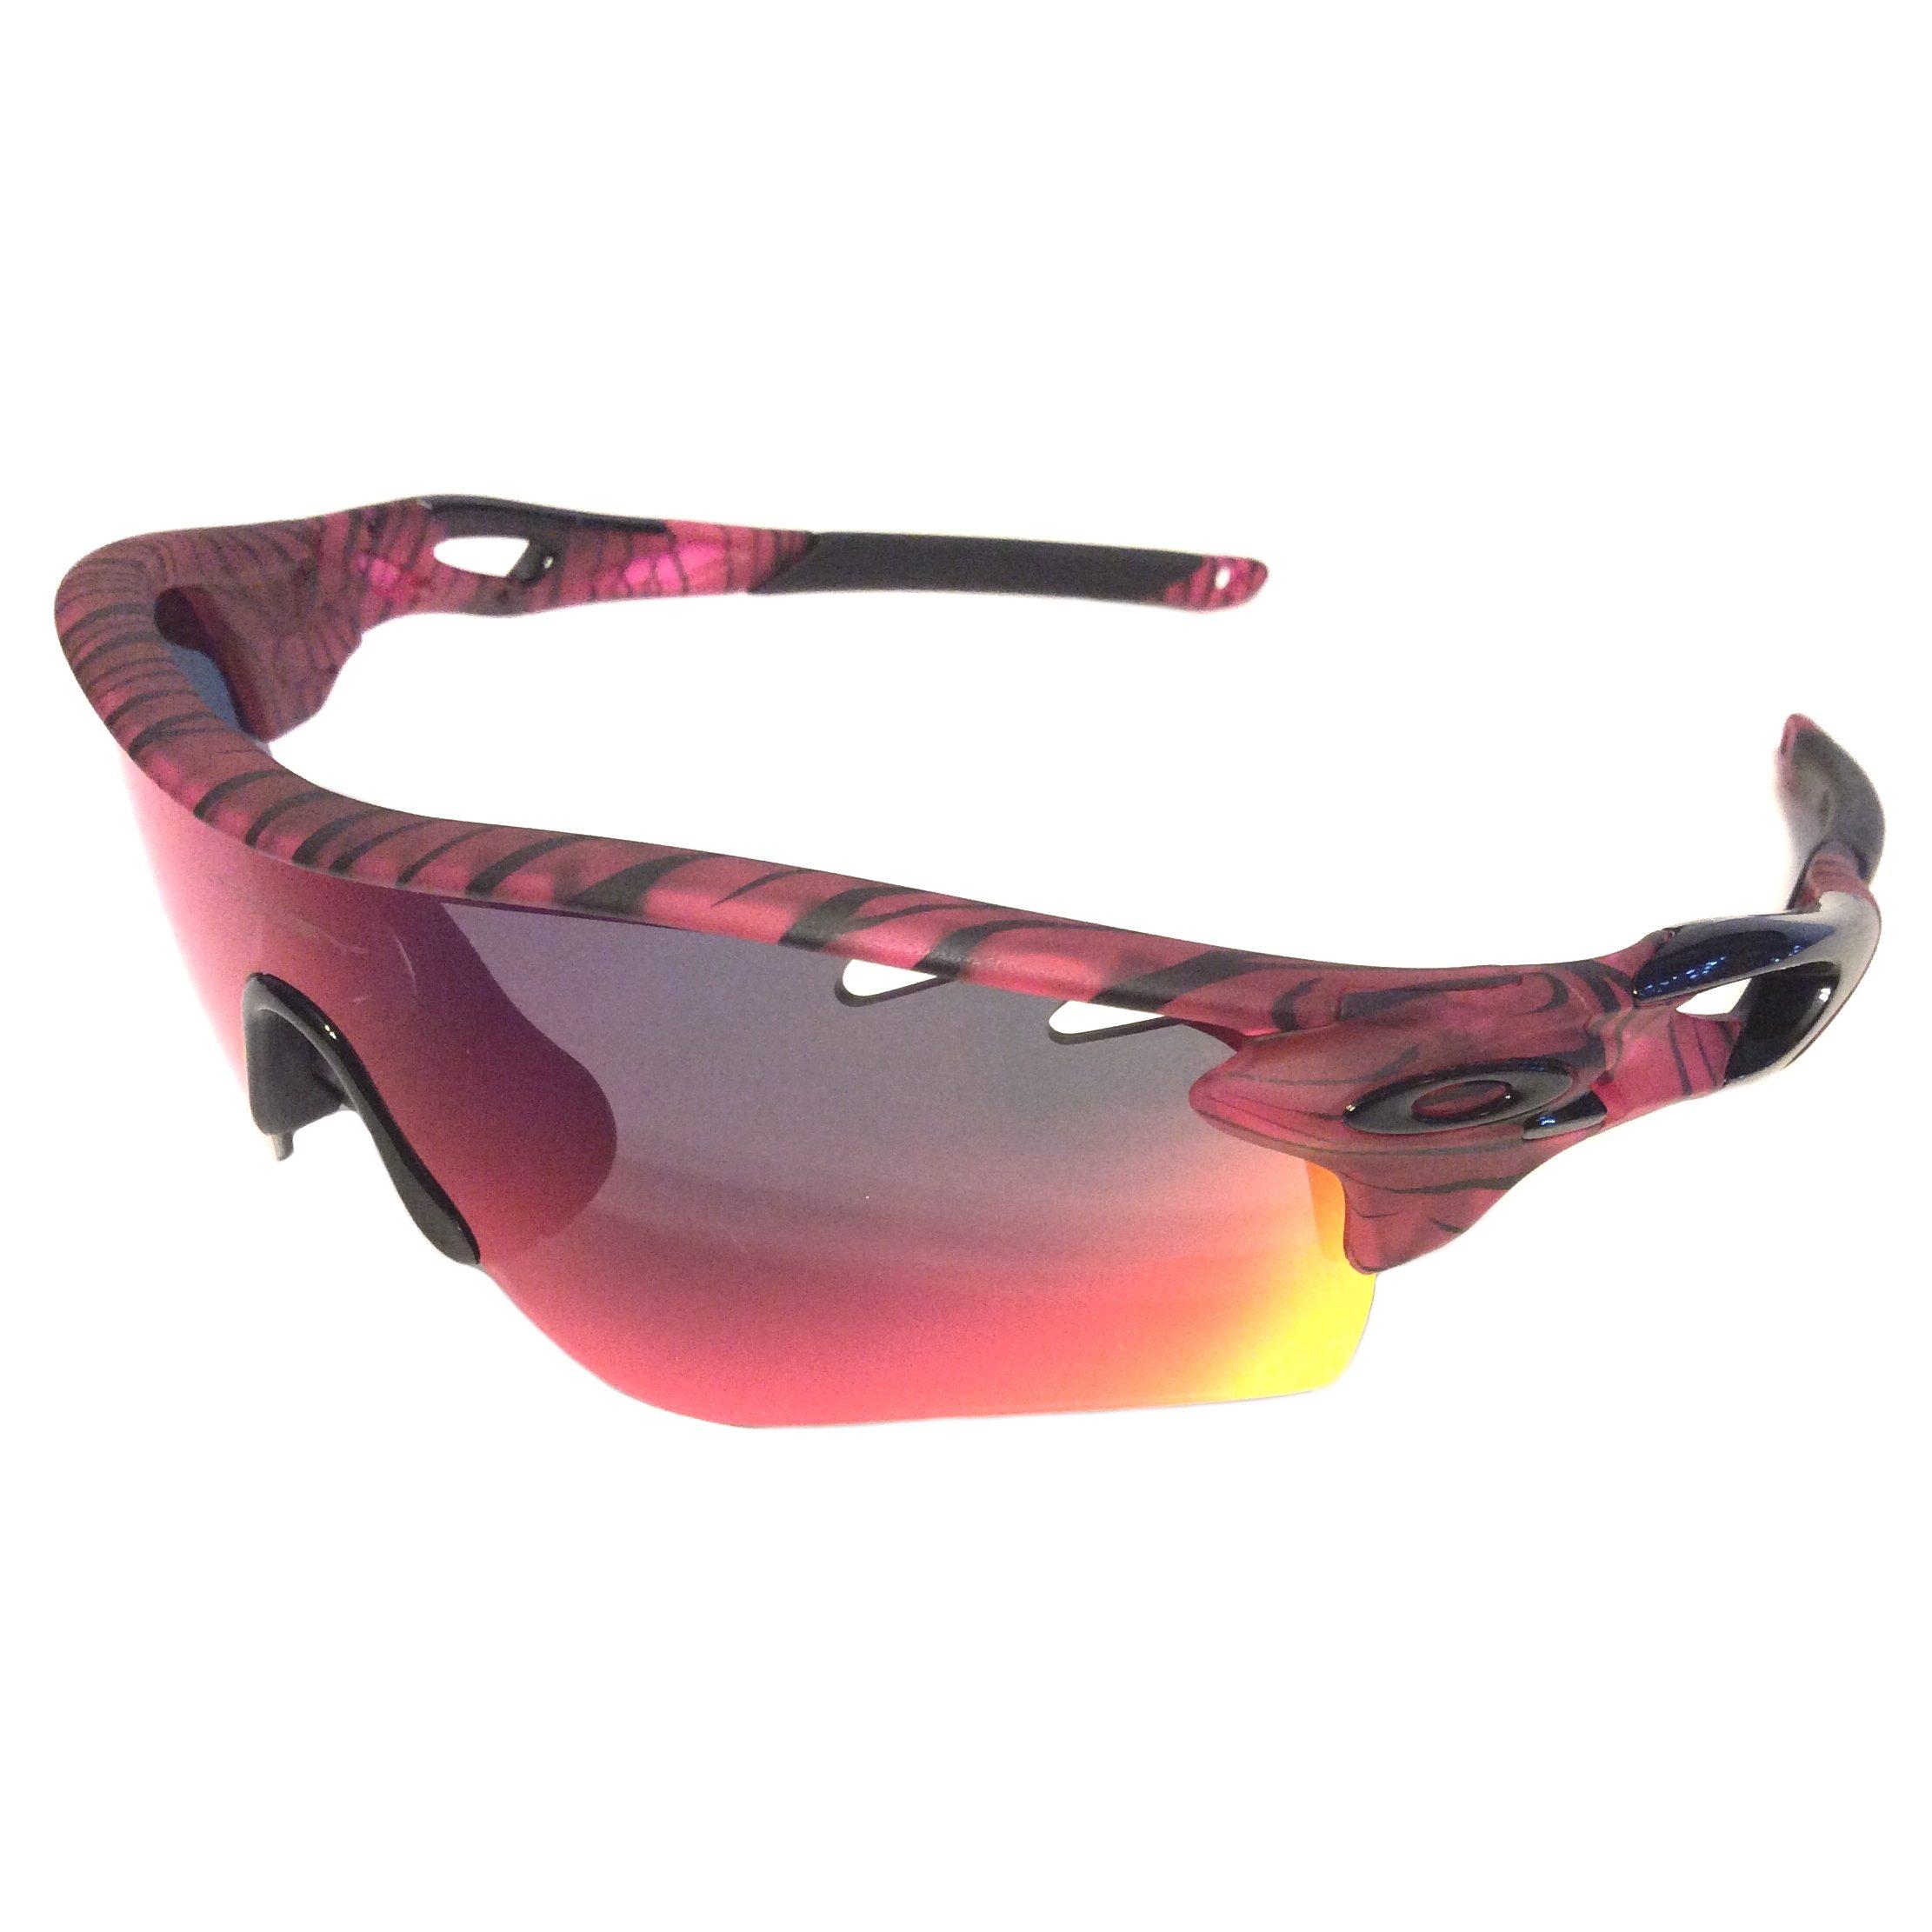 oakley radarlock nose piece 6h5w  Oakley Radarlock Path Vented Sunglasses A Urban Jungle Red Iridium  OO9206-35